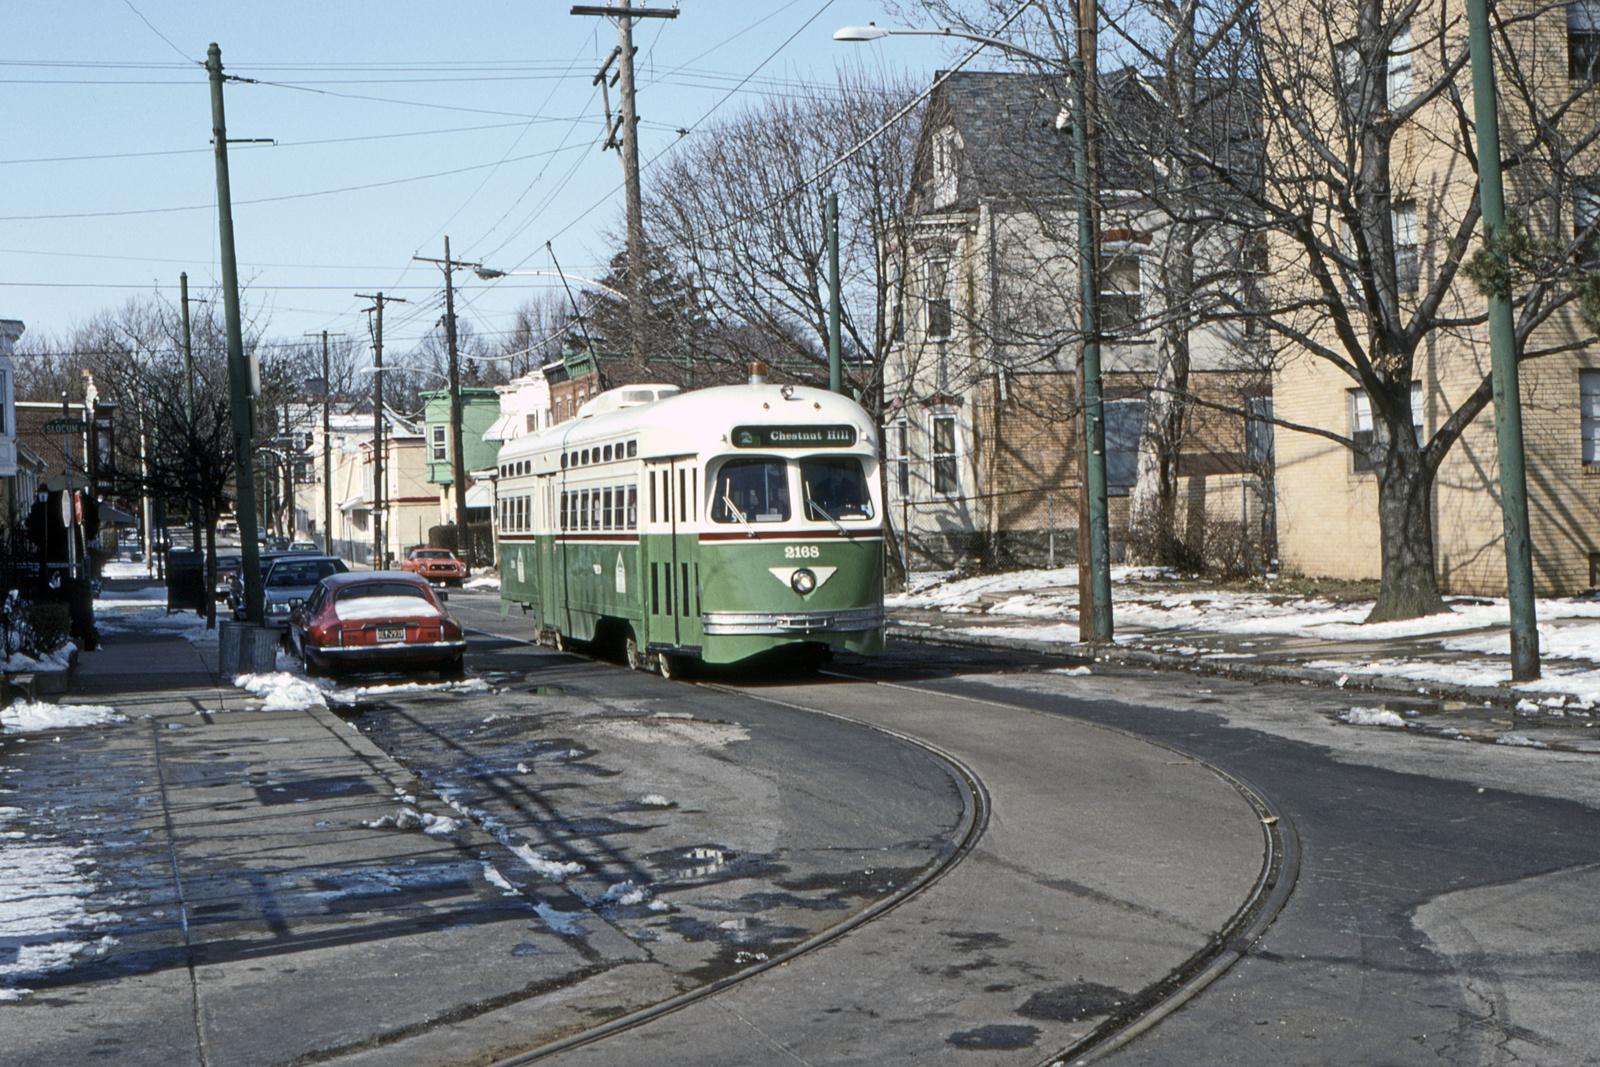 (1009k, 1600x1067)<br><b>Country:</b> United States<br><b>City:</b> Philadelphia, PA<br><b>System:</b> SEPTA (or Predecessor)<br><b>Line:</b> Rt. 23-Germantown<br><b>Location:</b> Germantown Depot<br><b>Car:</b> PTC/SEPTA Postwar All-electric PCC (St.Louis, 1948) 2168 <br><b>Collection of:</b> David Pirmann<br><b>Date:</b> 3/1993<br><b>Viewed (this week/total):</b> 0 / 45